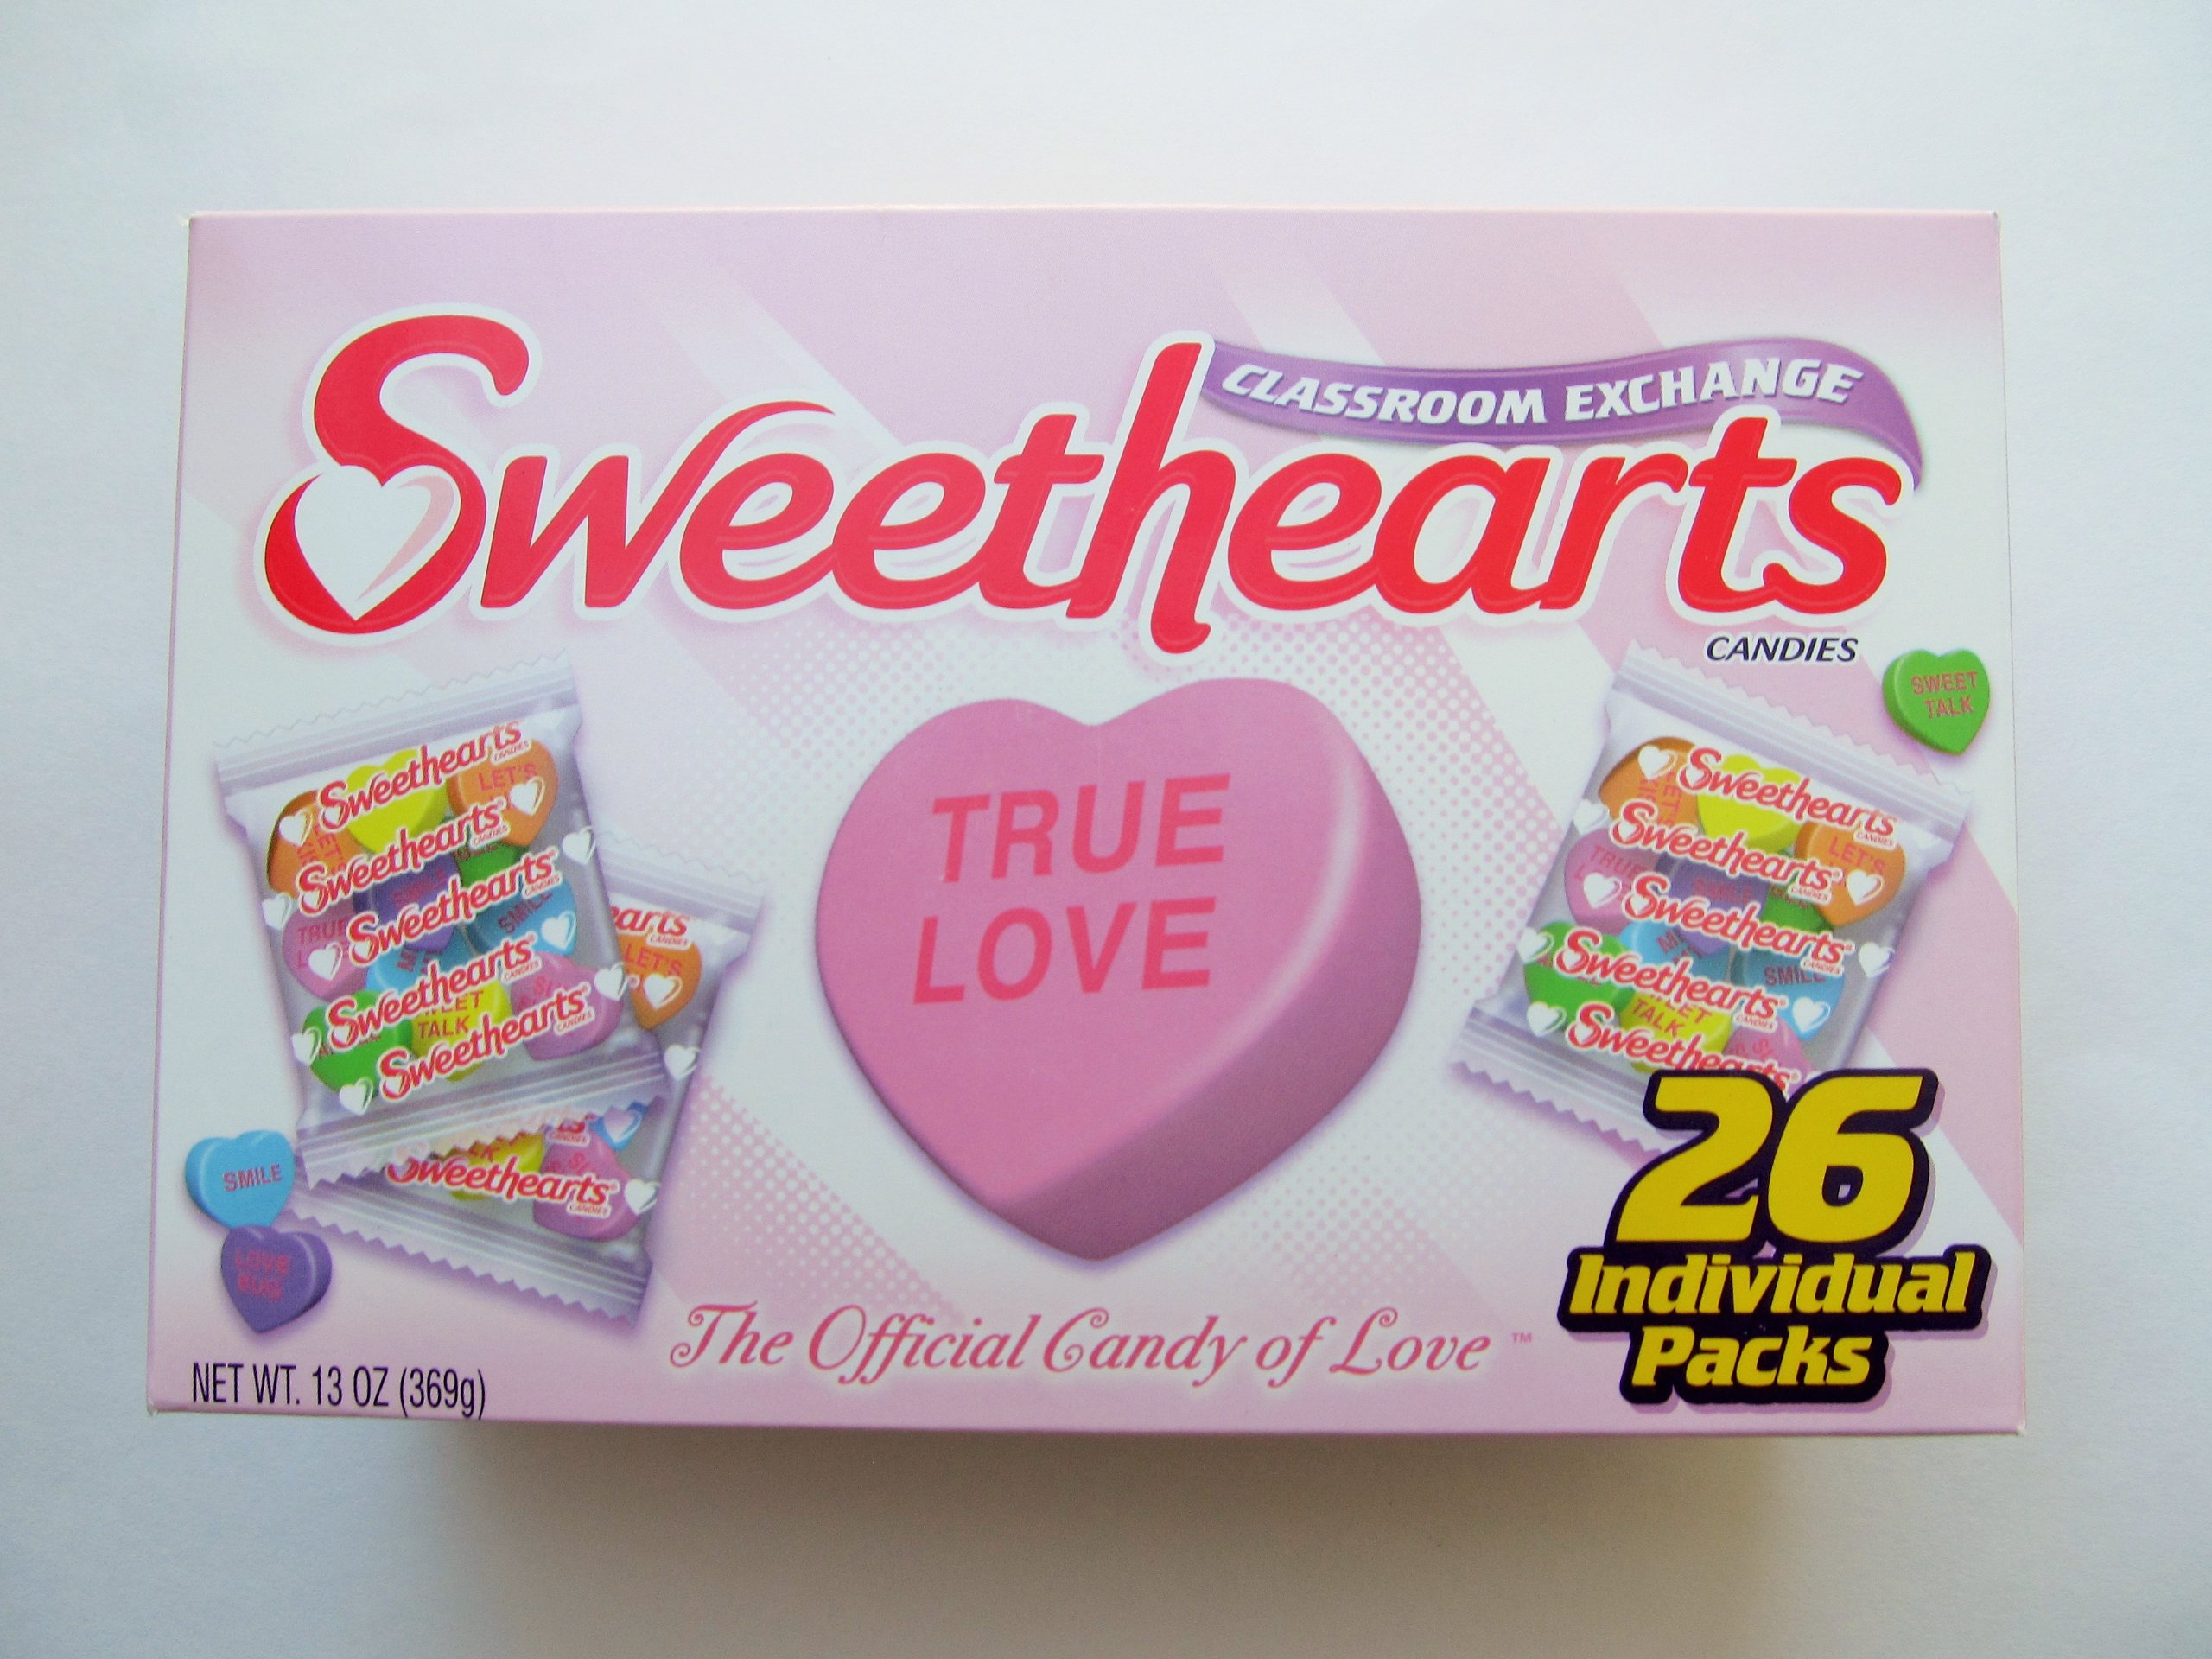 Sweethearts Classroom Exchange Candies (26 Individual Packs) 13 oz